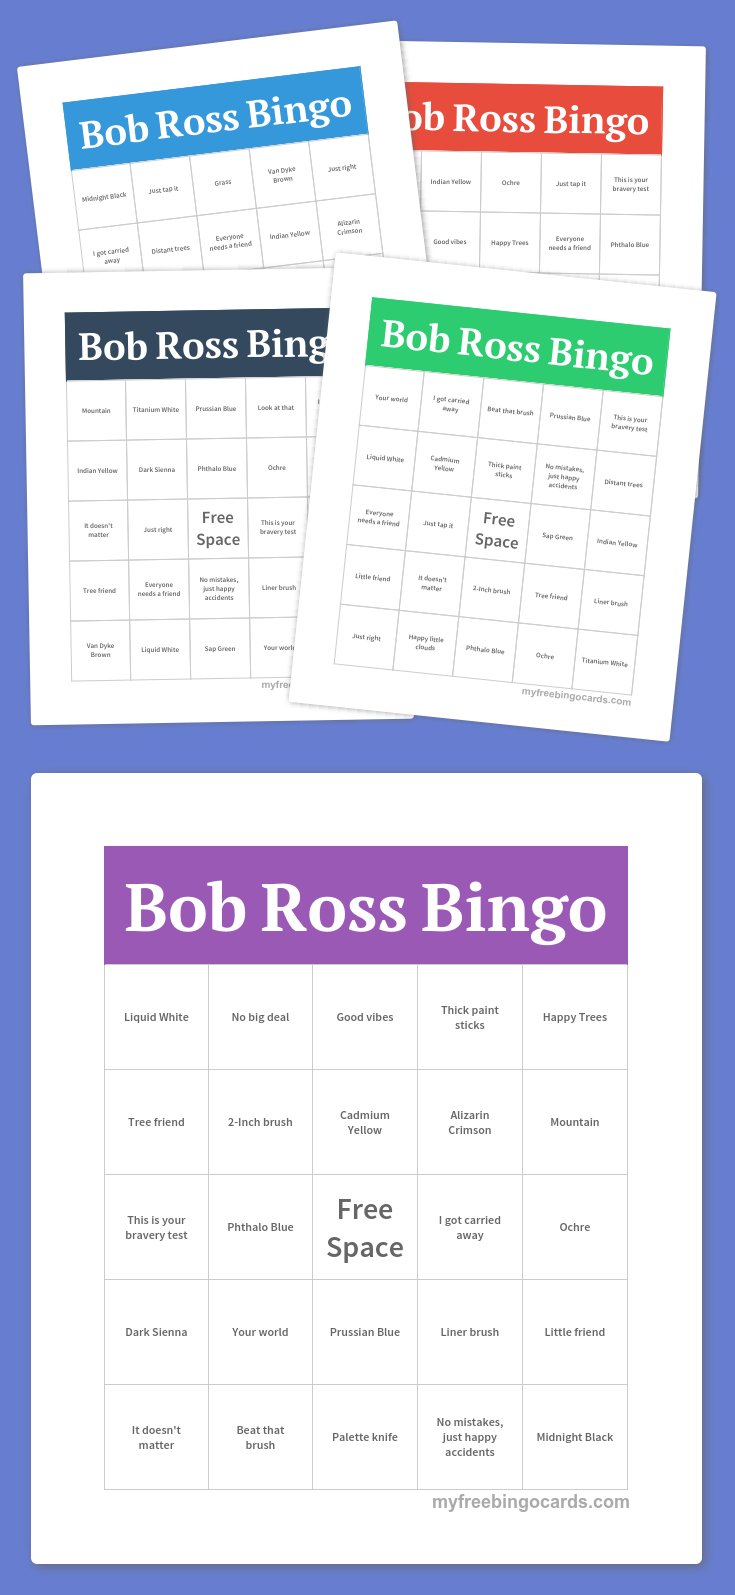 Bob Ross Bingo | Free Bingo Cards, Free Printable Bingo